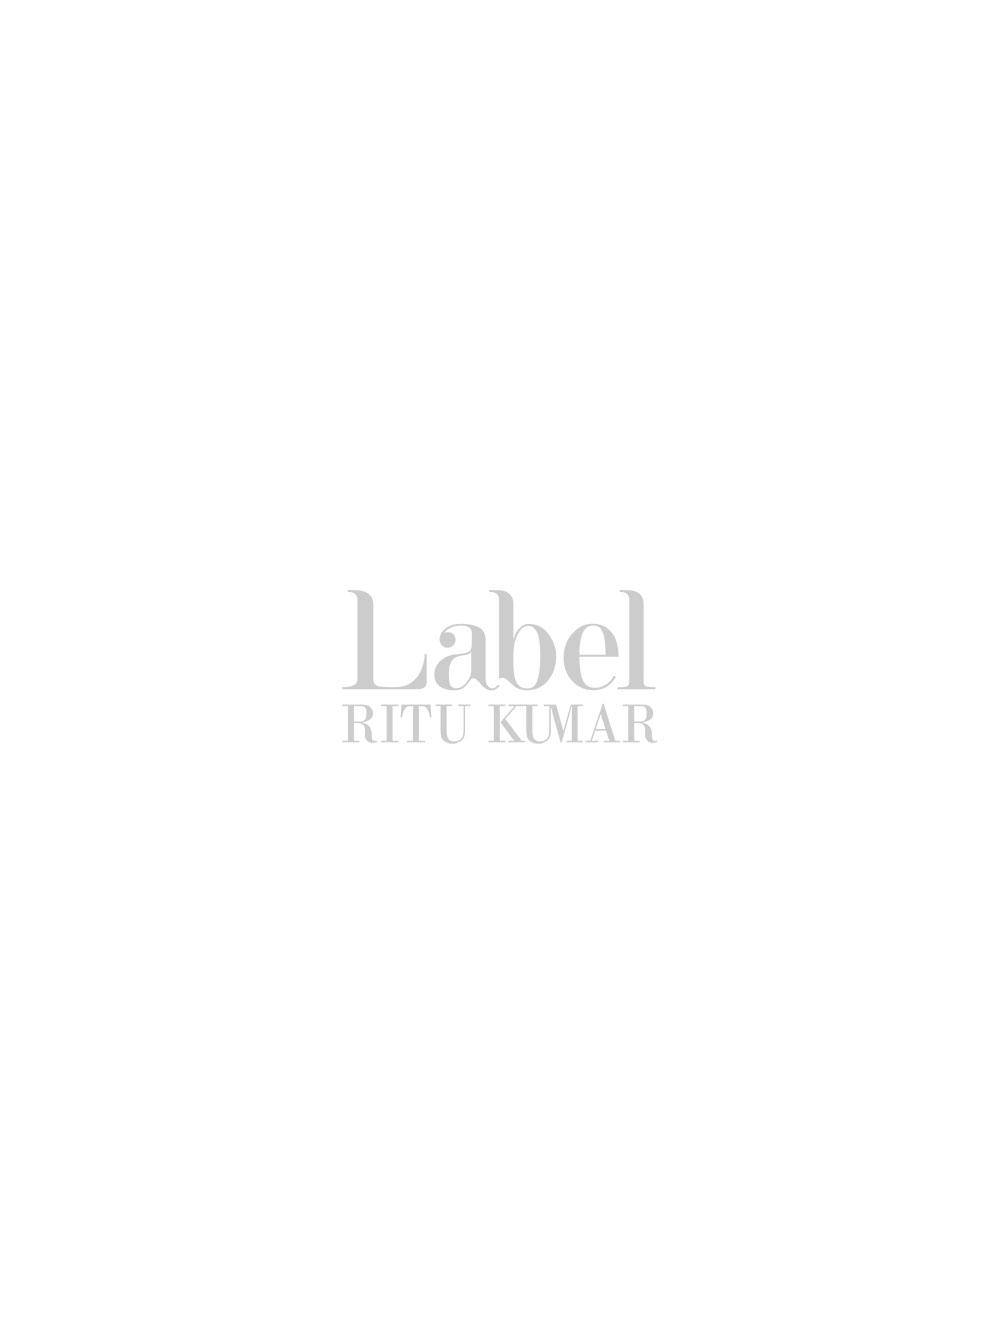 Khaki Jumpsuit in a signature Ritu Kumar Criss Cross Pattern